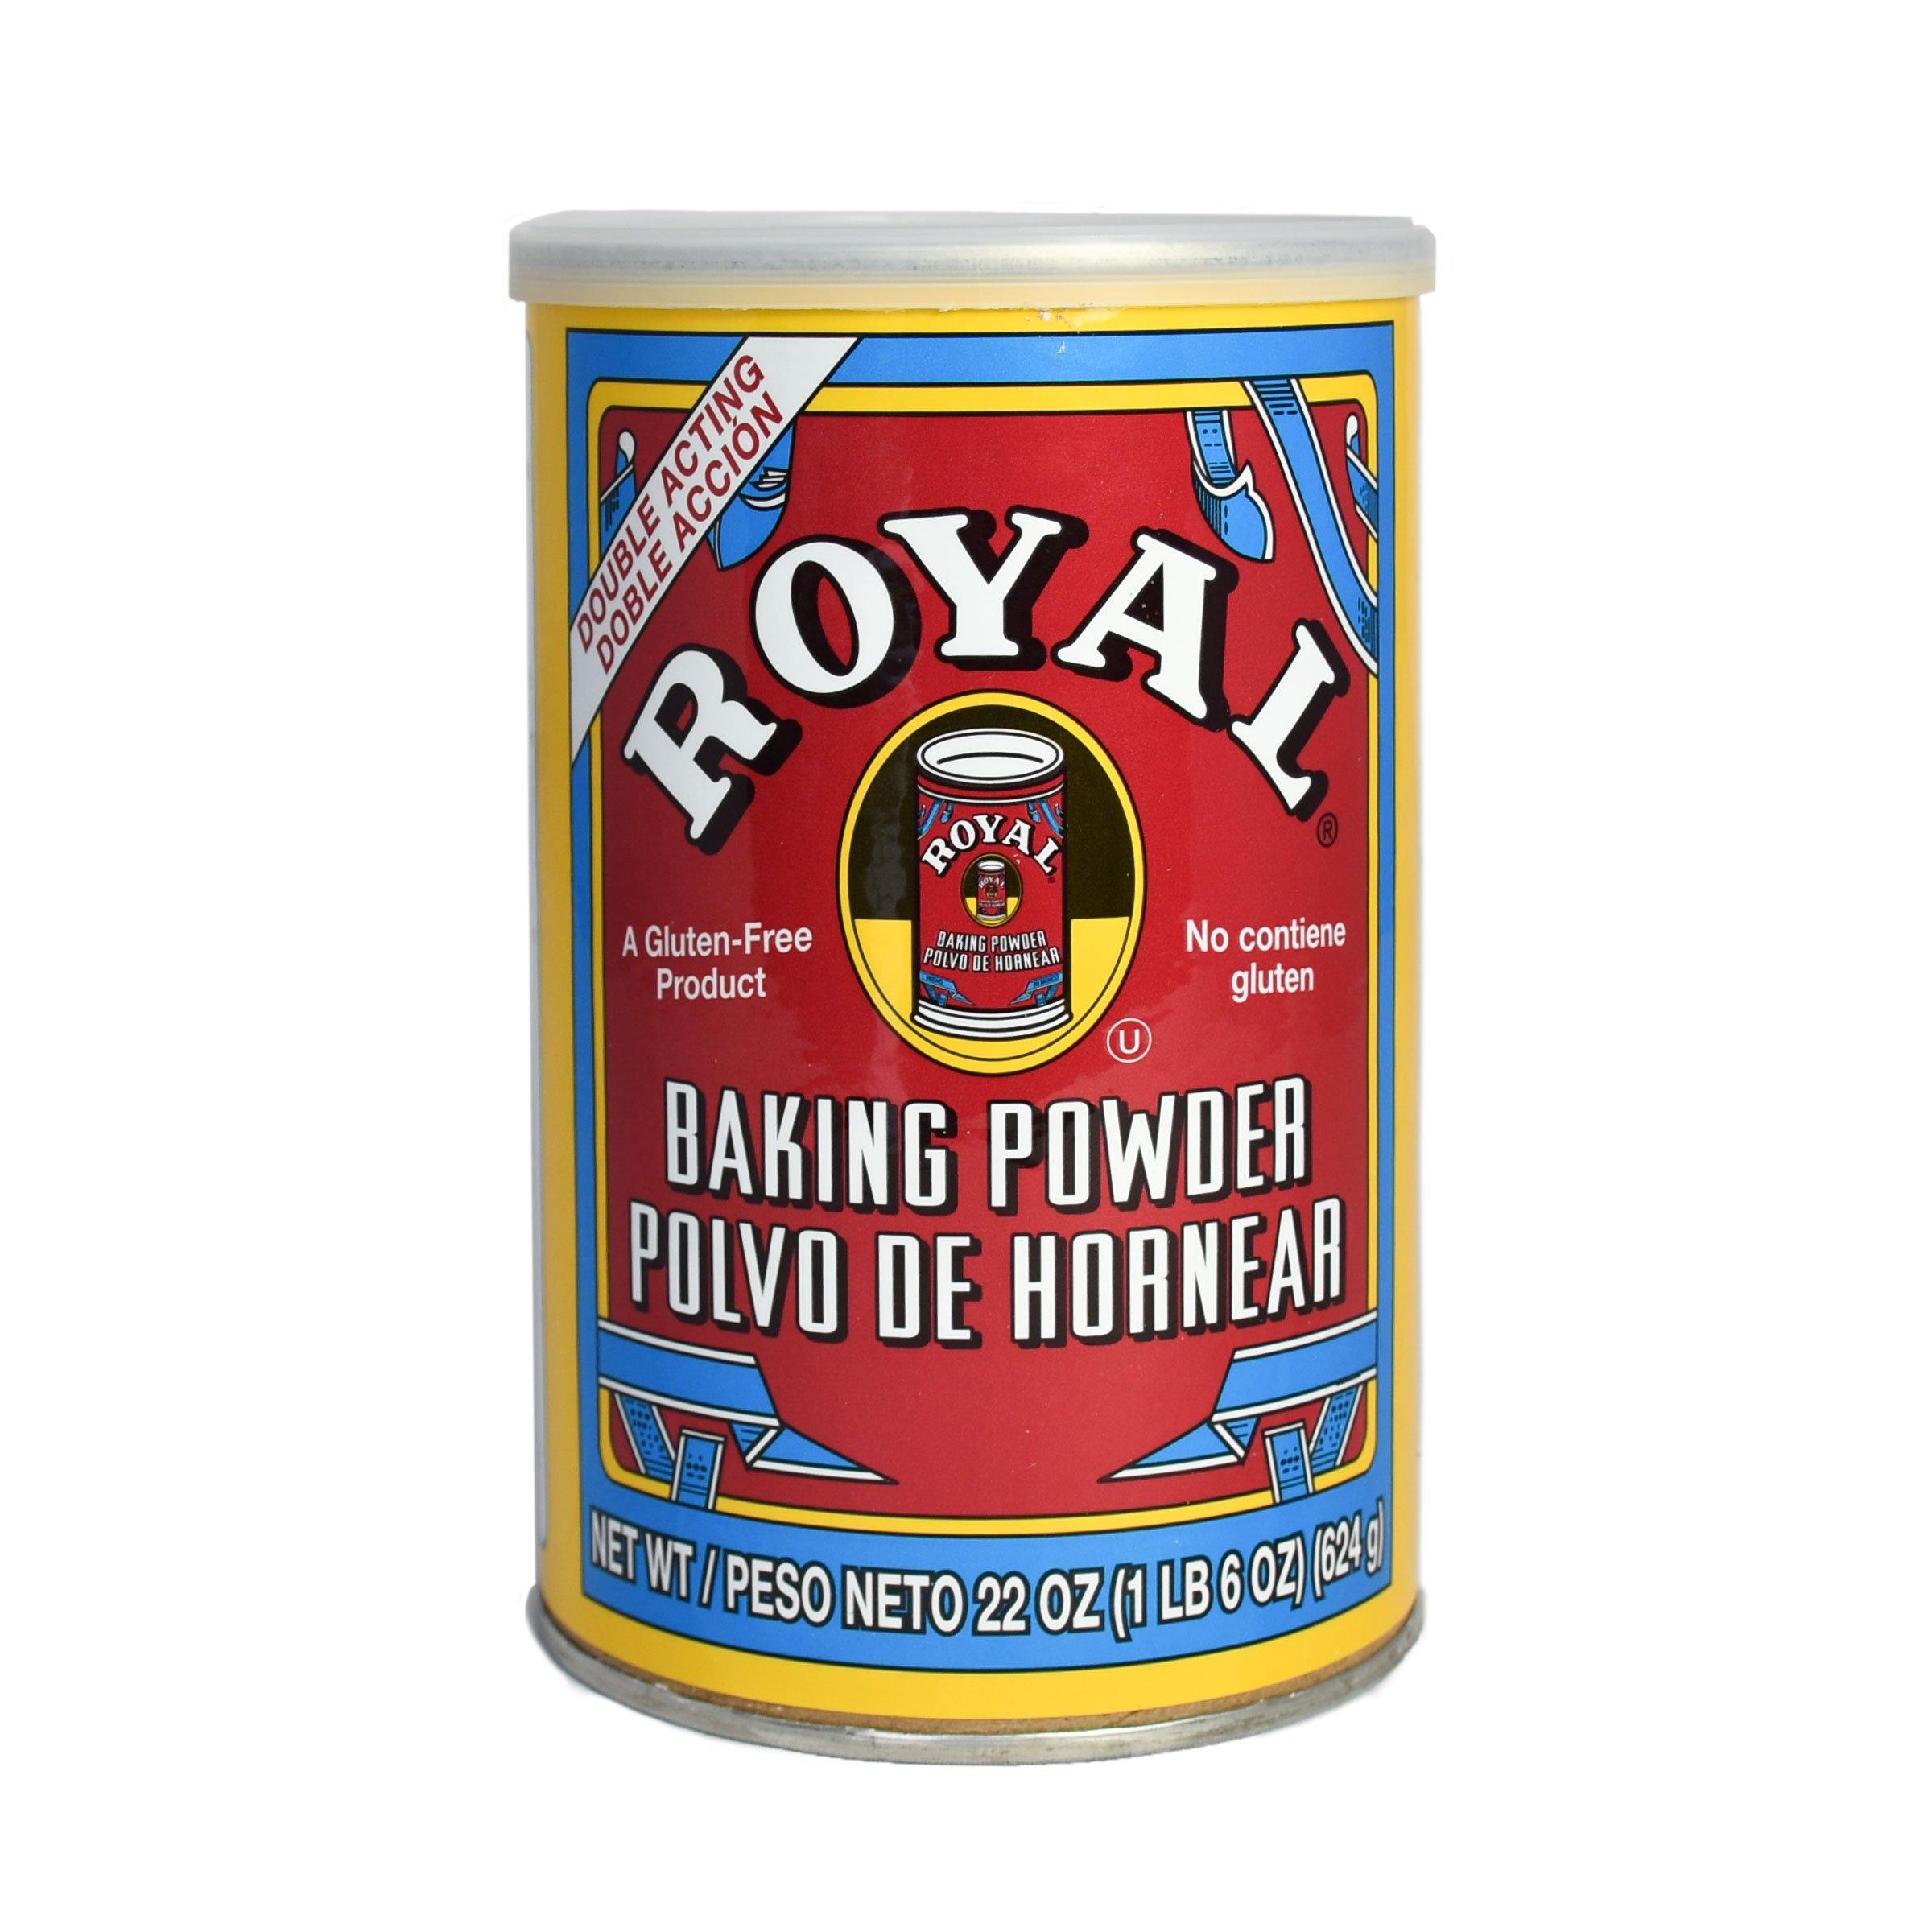 Royal Baking Powder, Gluten Free, Vegan, Vegetarian, Double Acting Baking Powder in a Resealable Can with Easy Measure Lid, Kosher, Halal